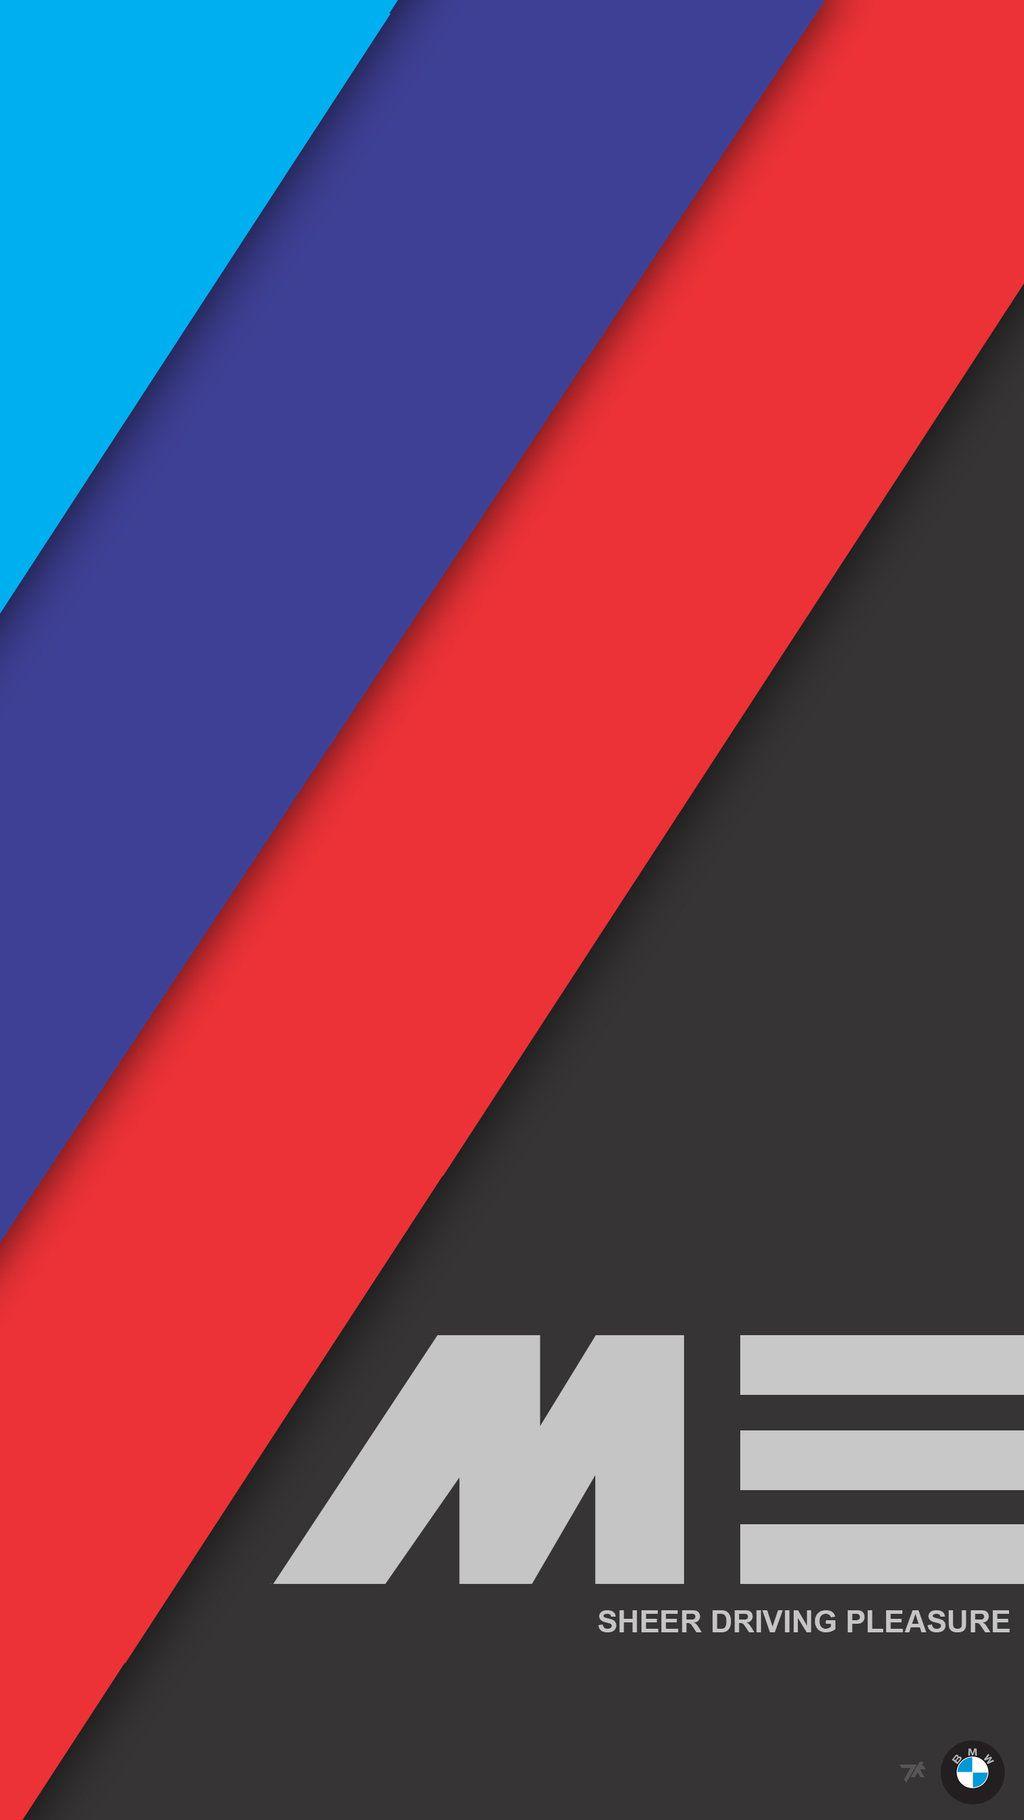 Minflat bmw m performance mobile wallpaper 2k by dakoder http